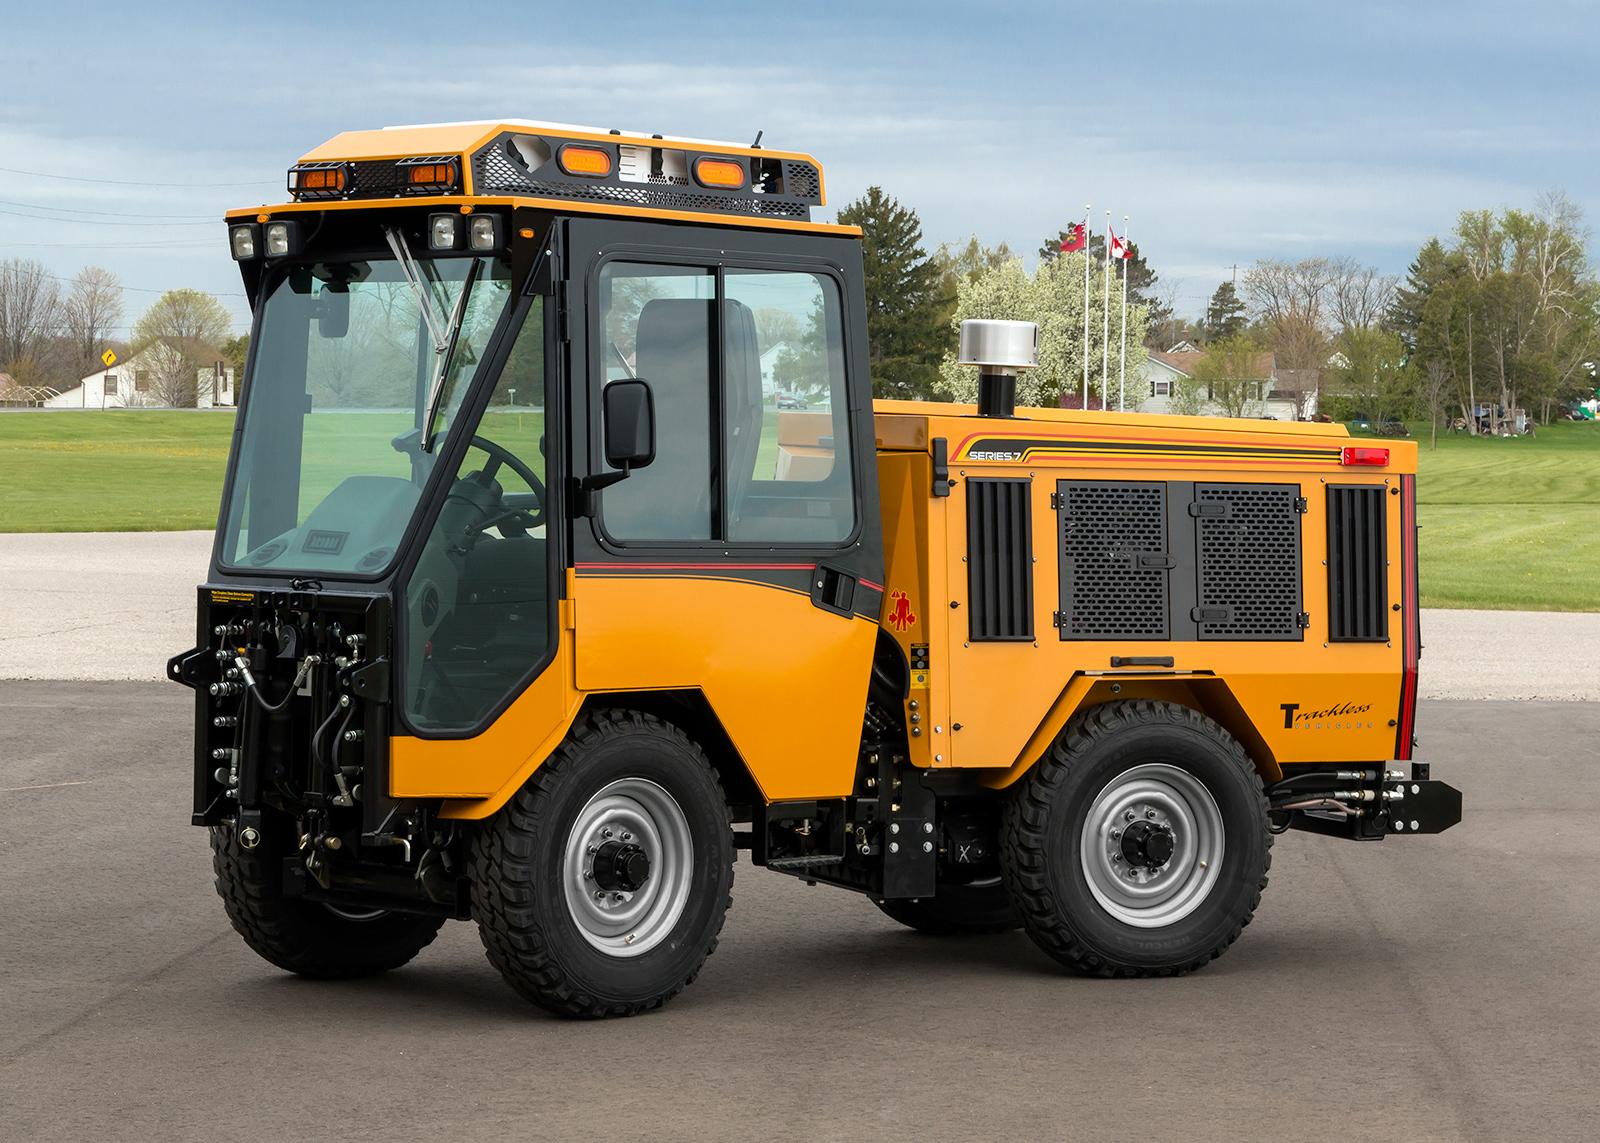 trackless vehicles history mt7 model sidewalk municipal tractor